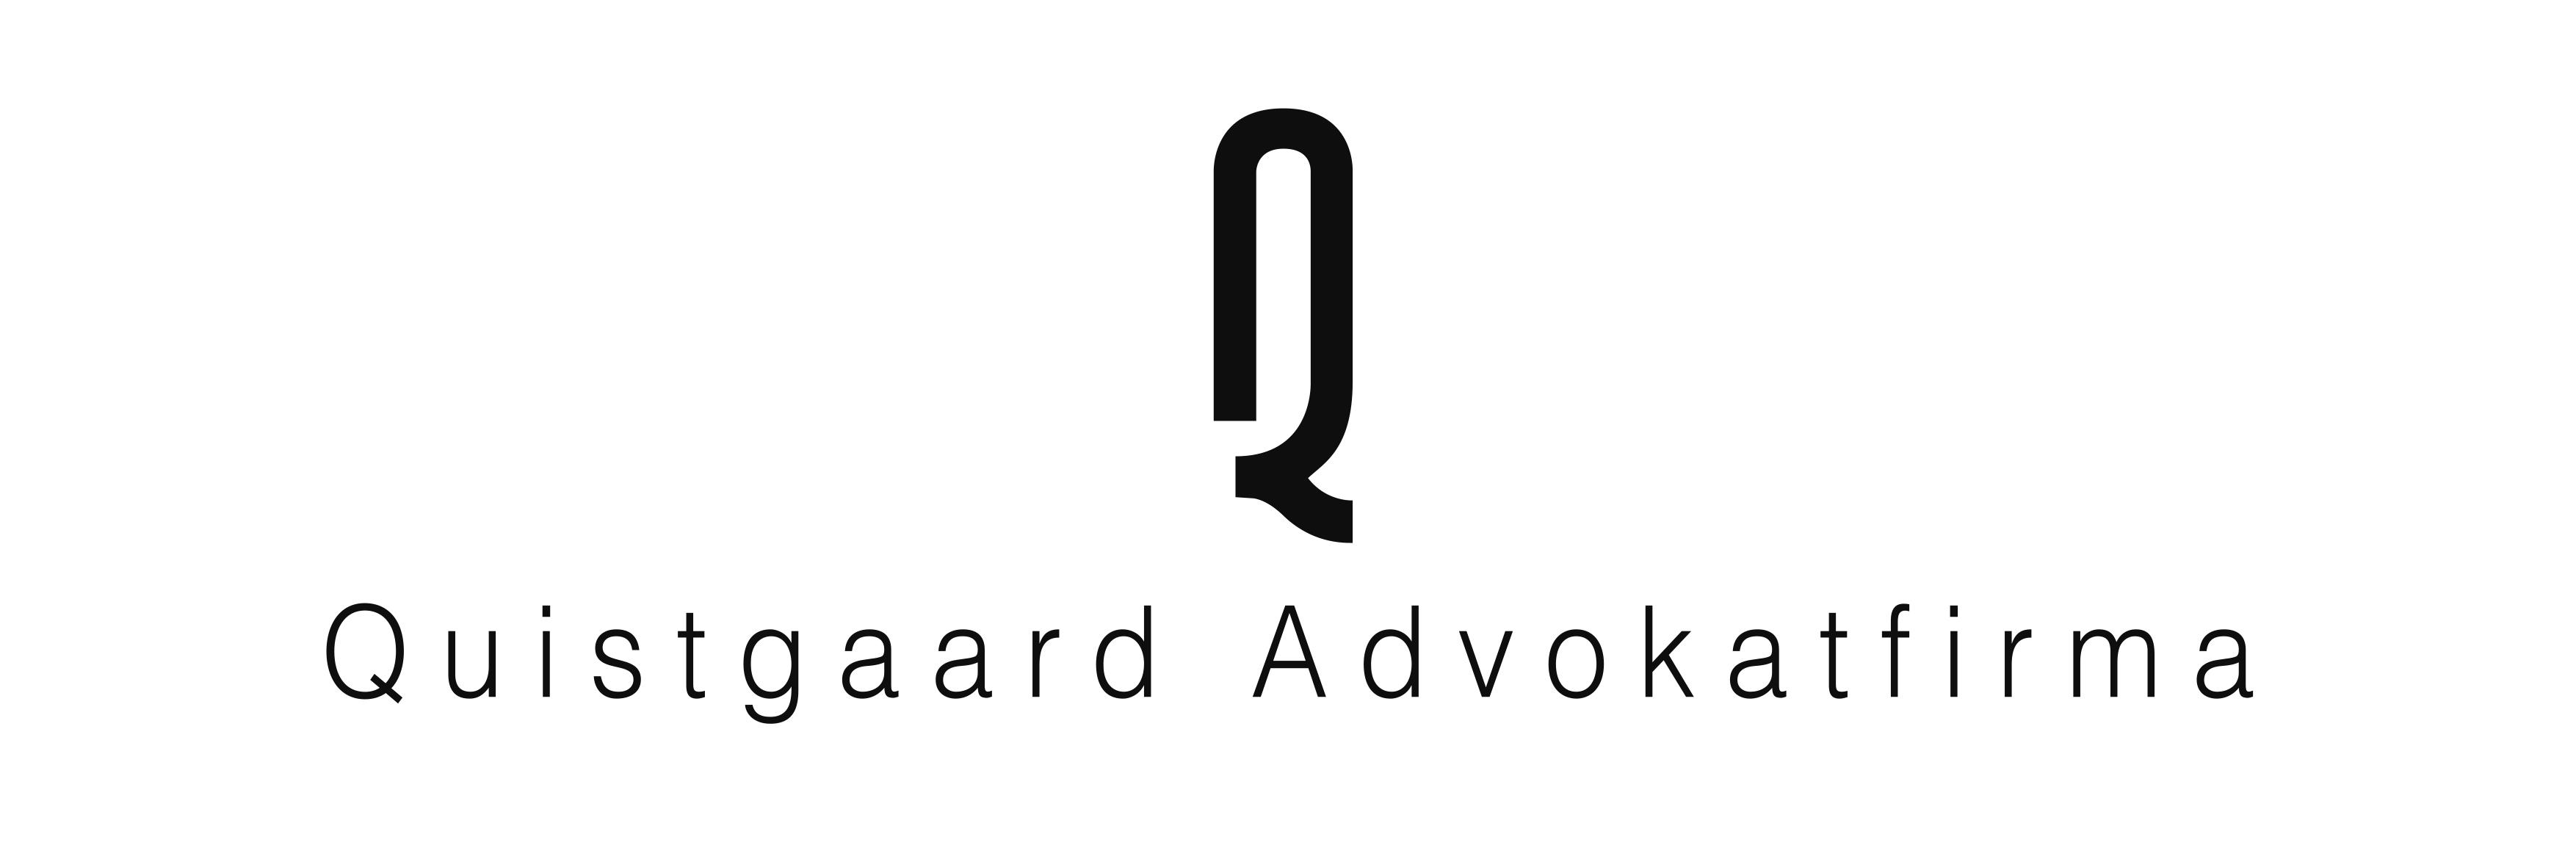 Quistgaard Advokatfirma